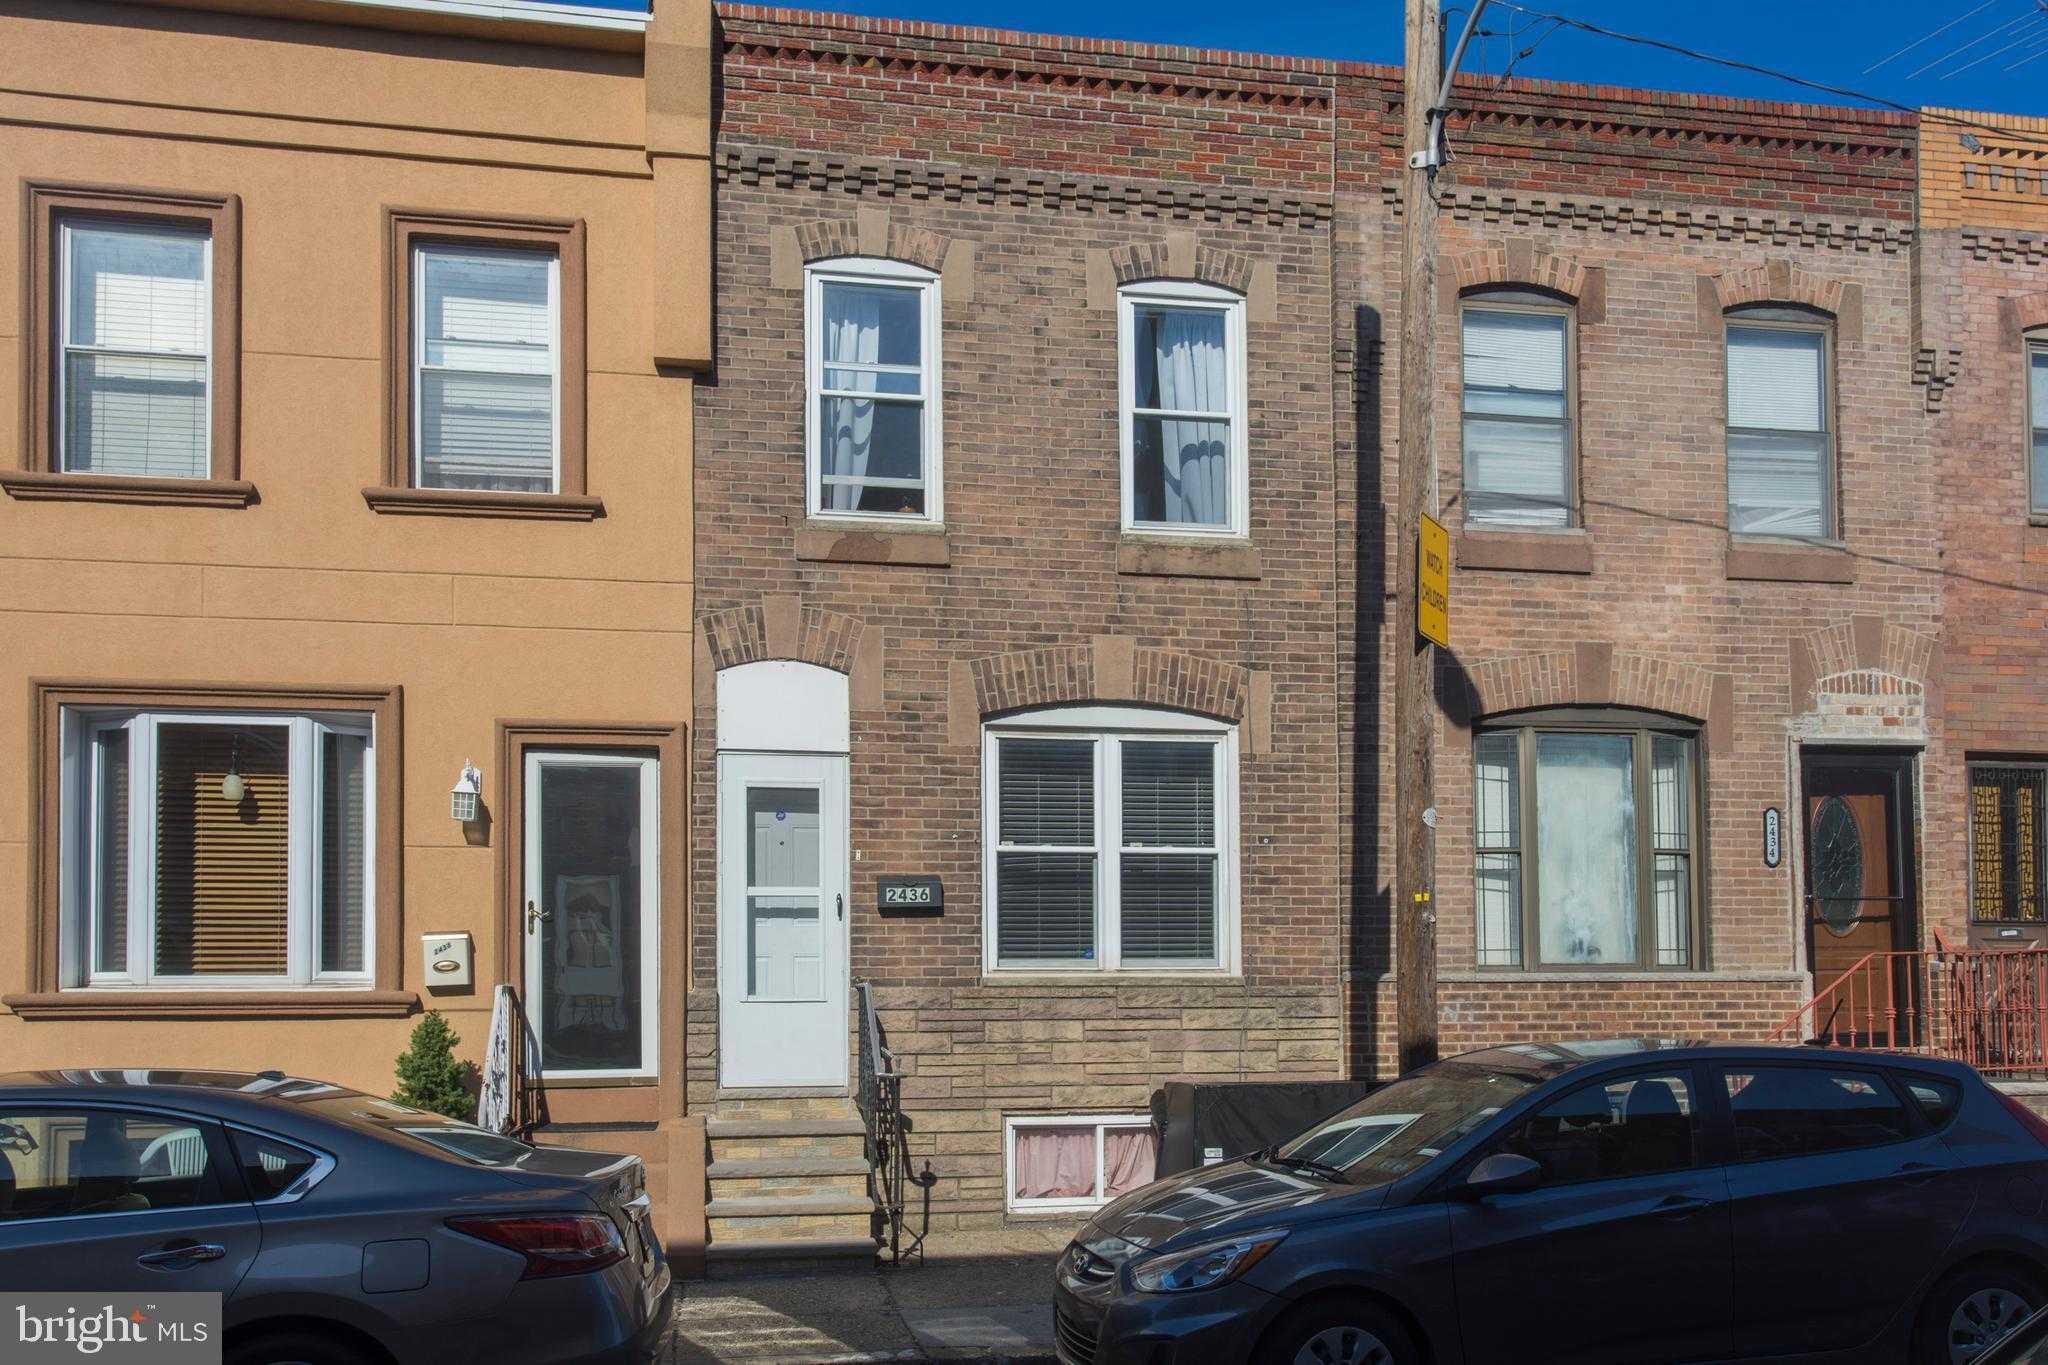 $249,900 - 3Br/1Ba -  for Sale in Whitman, Philadelphia